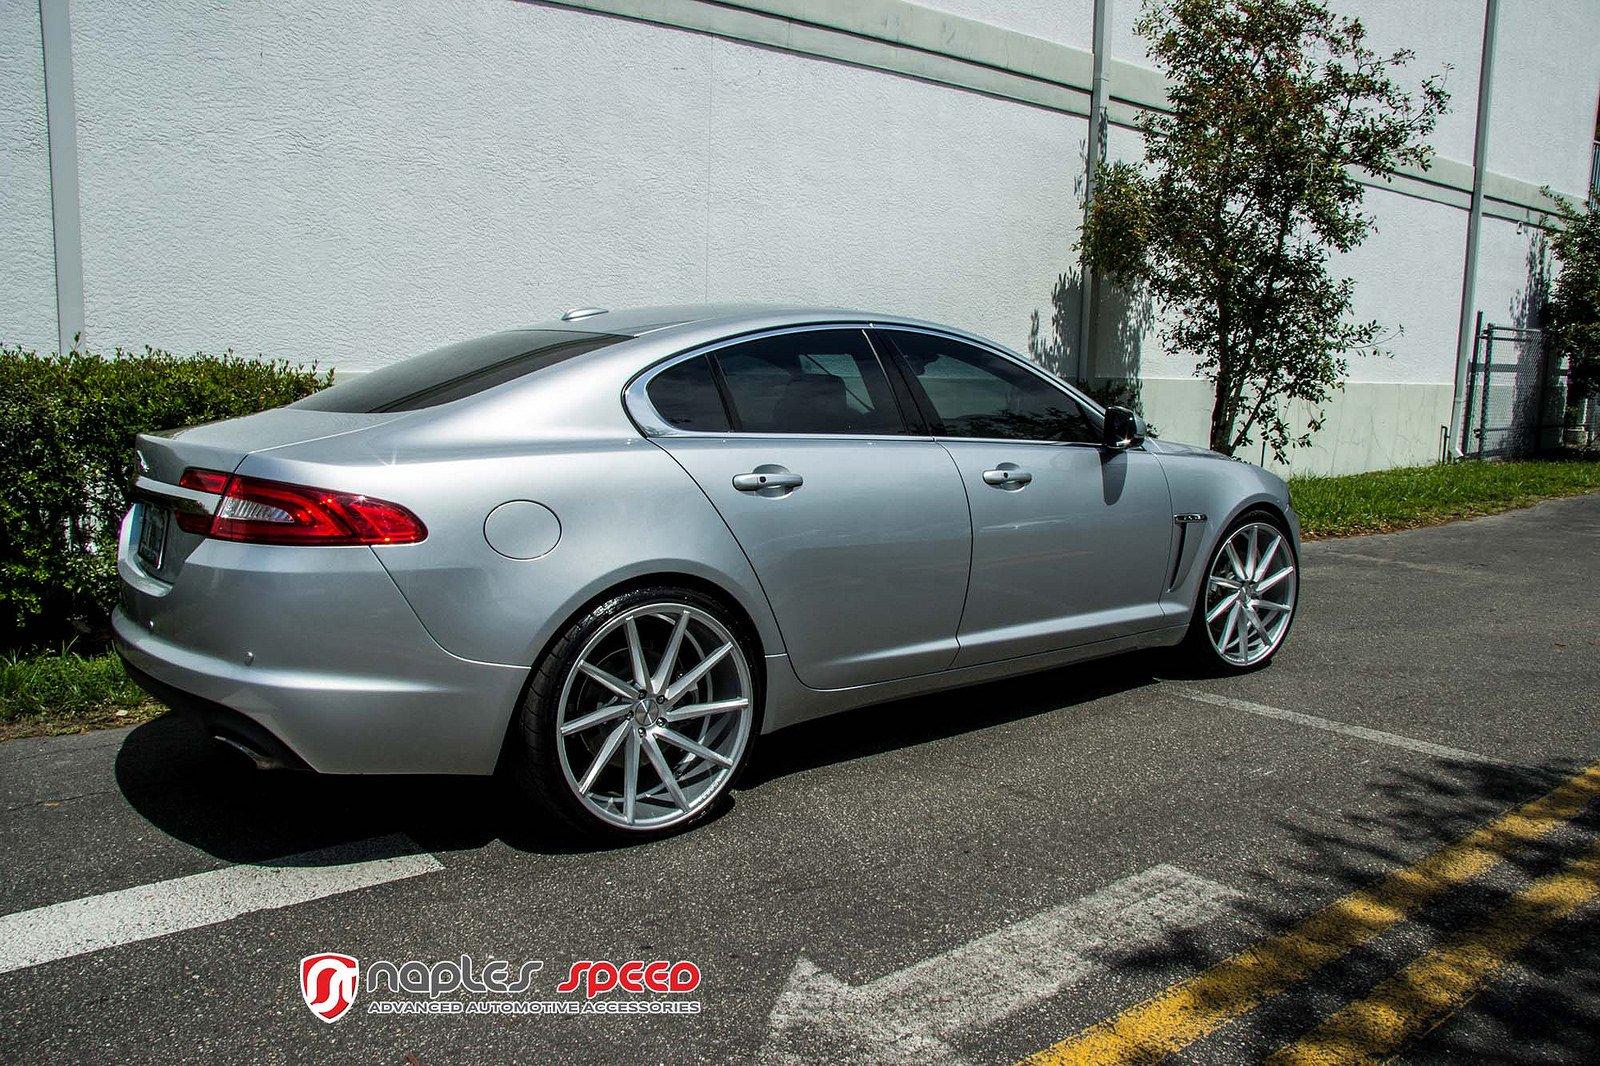 vossen wheels jaguar xf tuning cars wallpaper 1600x1066. Black Bedroom Furniture Sets. Home Design Ideas